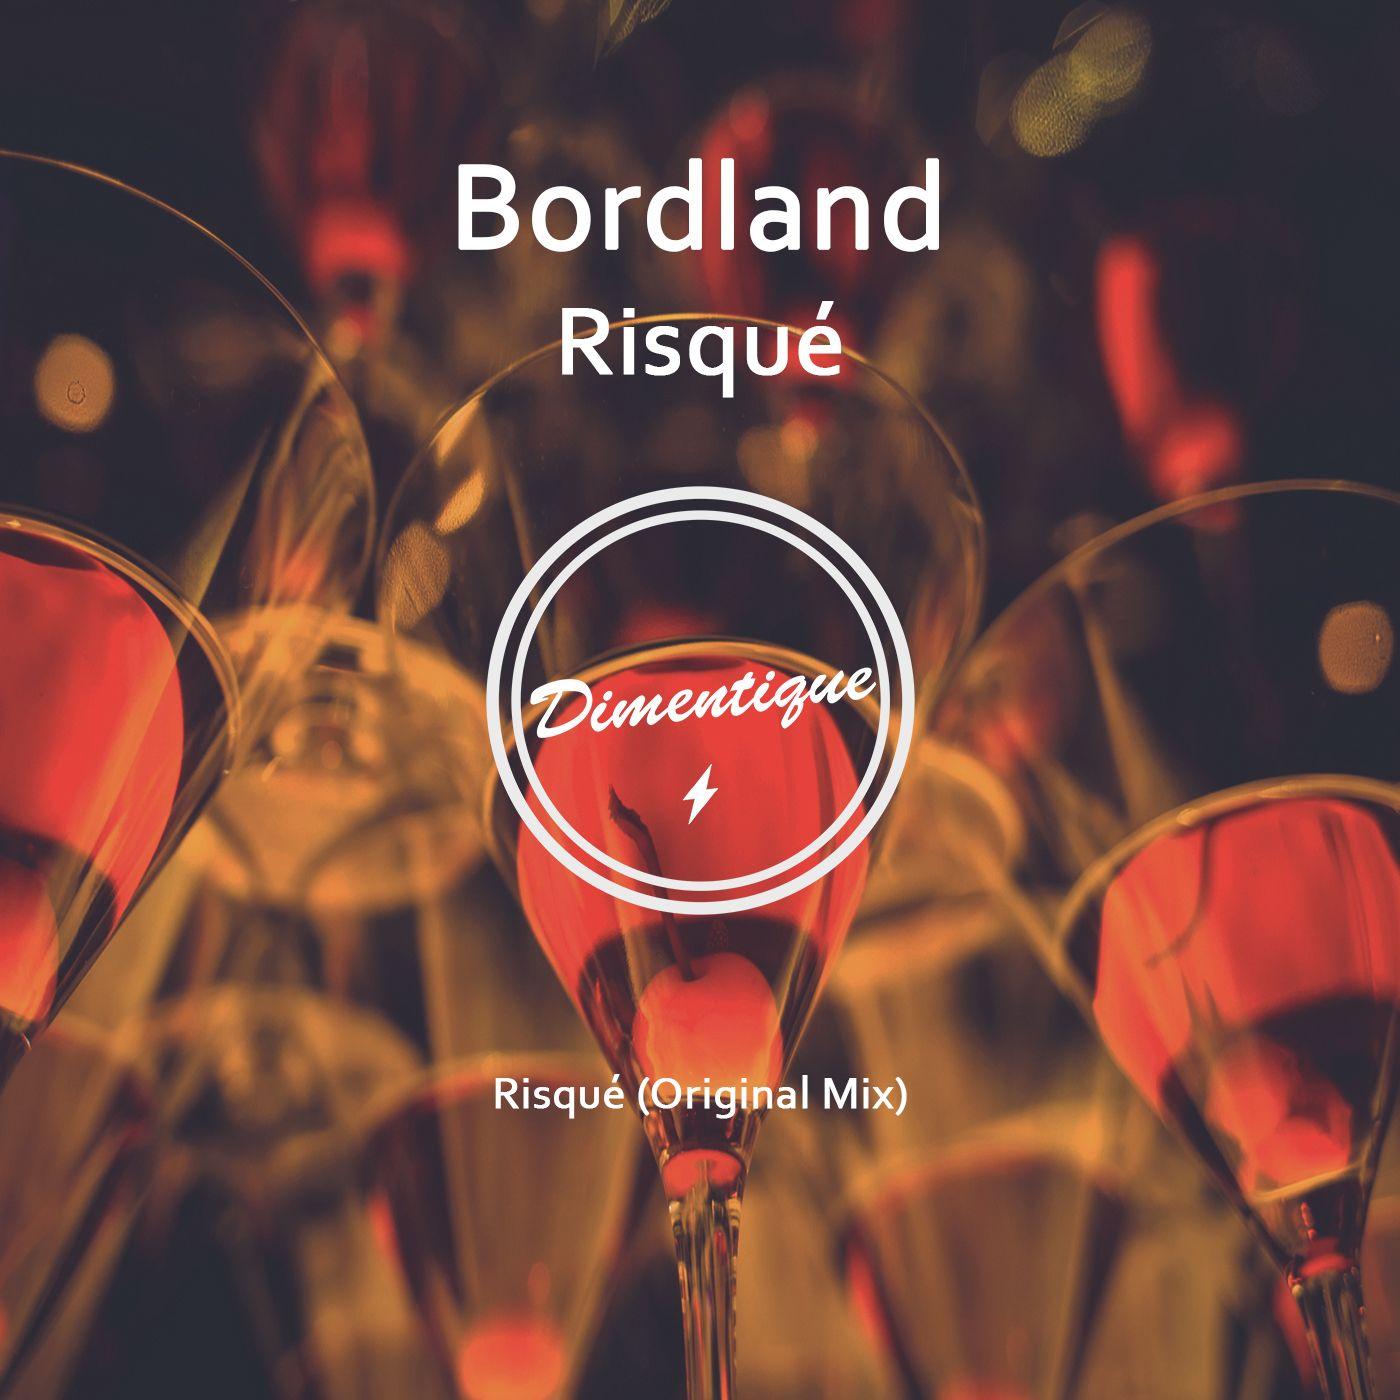 dimentique_new_art_2016_bordland_risque.jpg